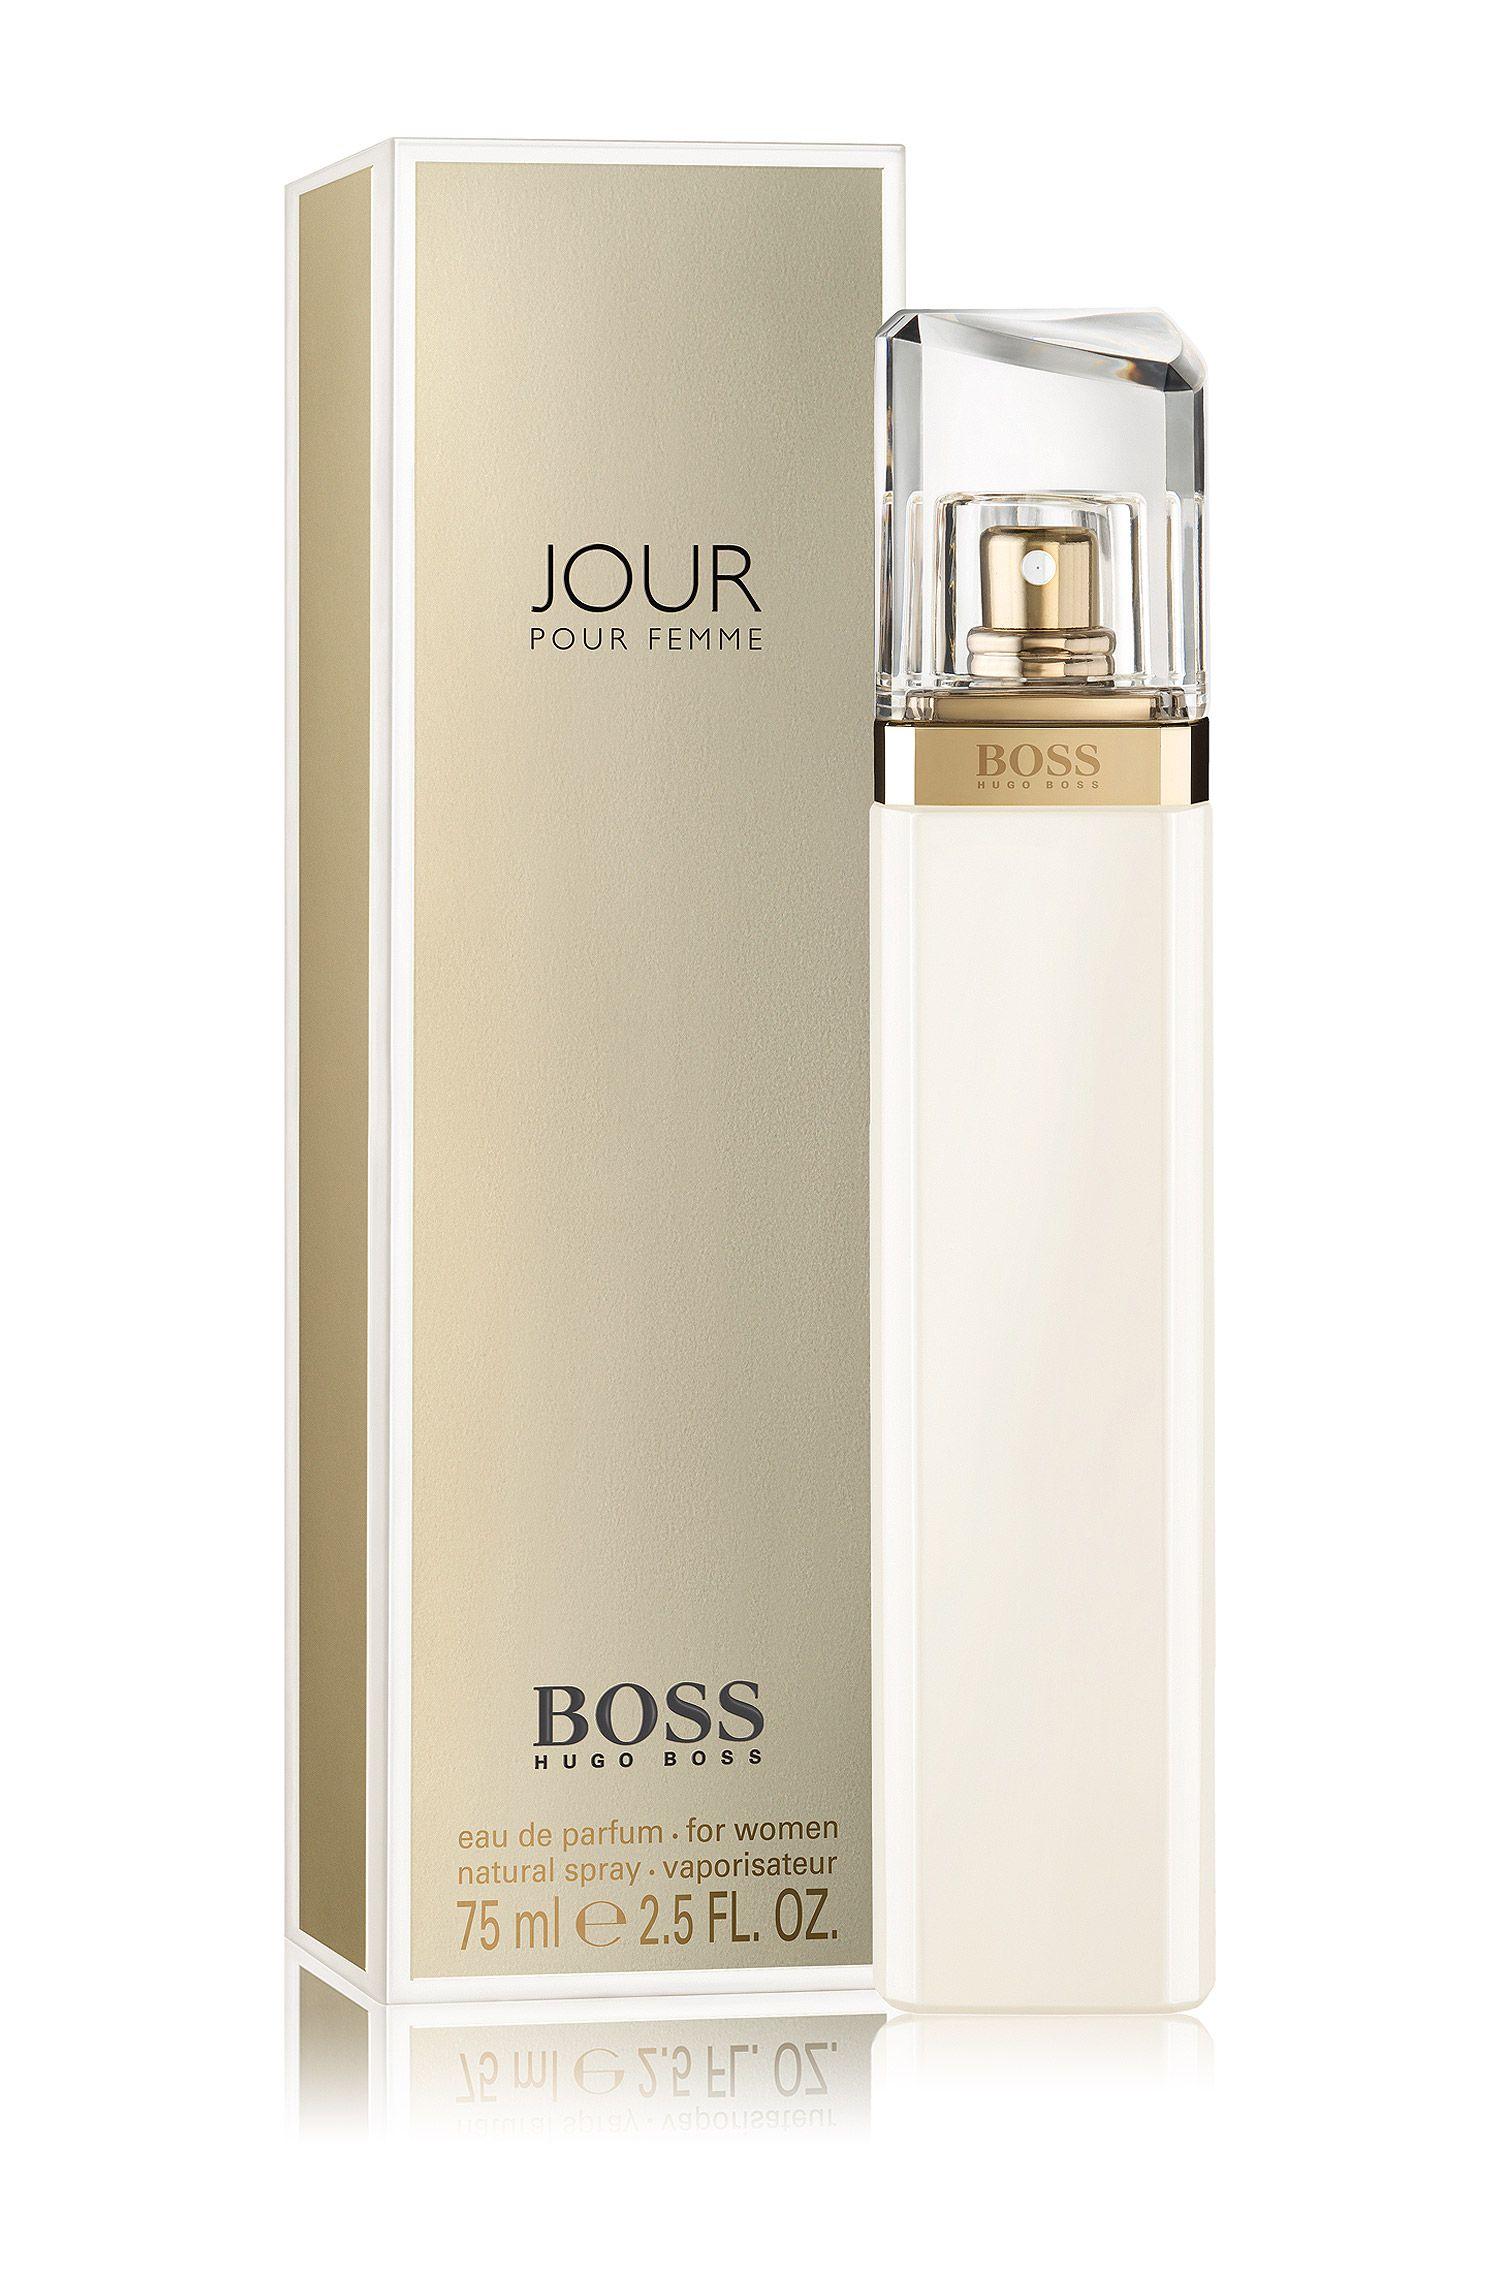 BOSS Jour Eau de Parfum 75 ml